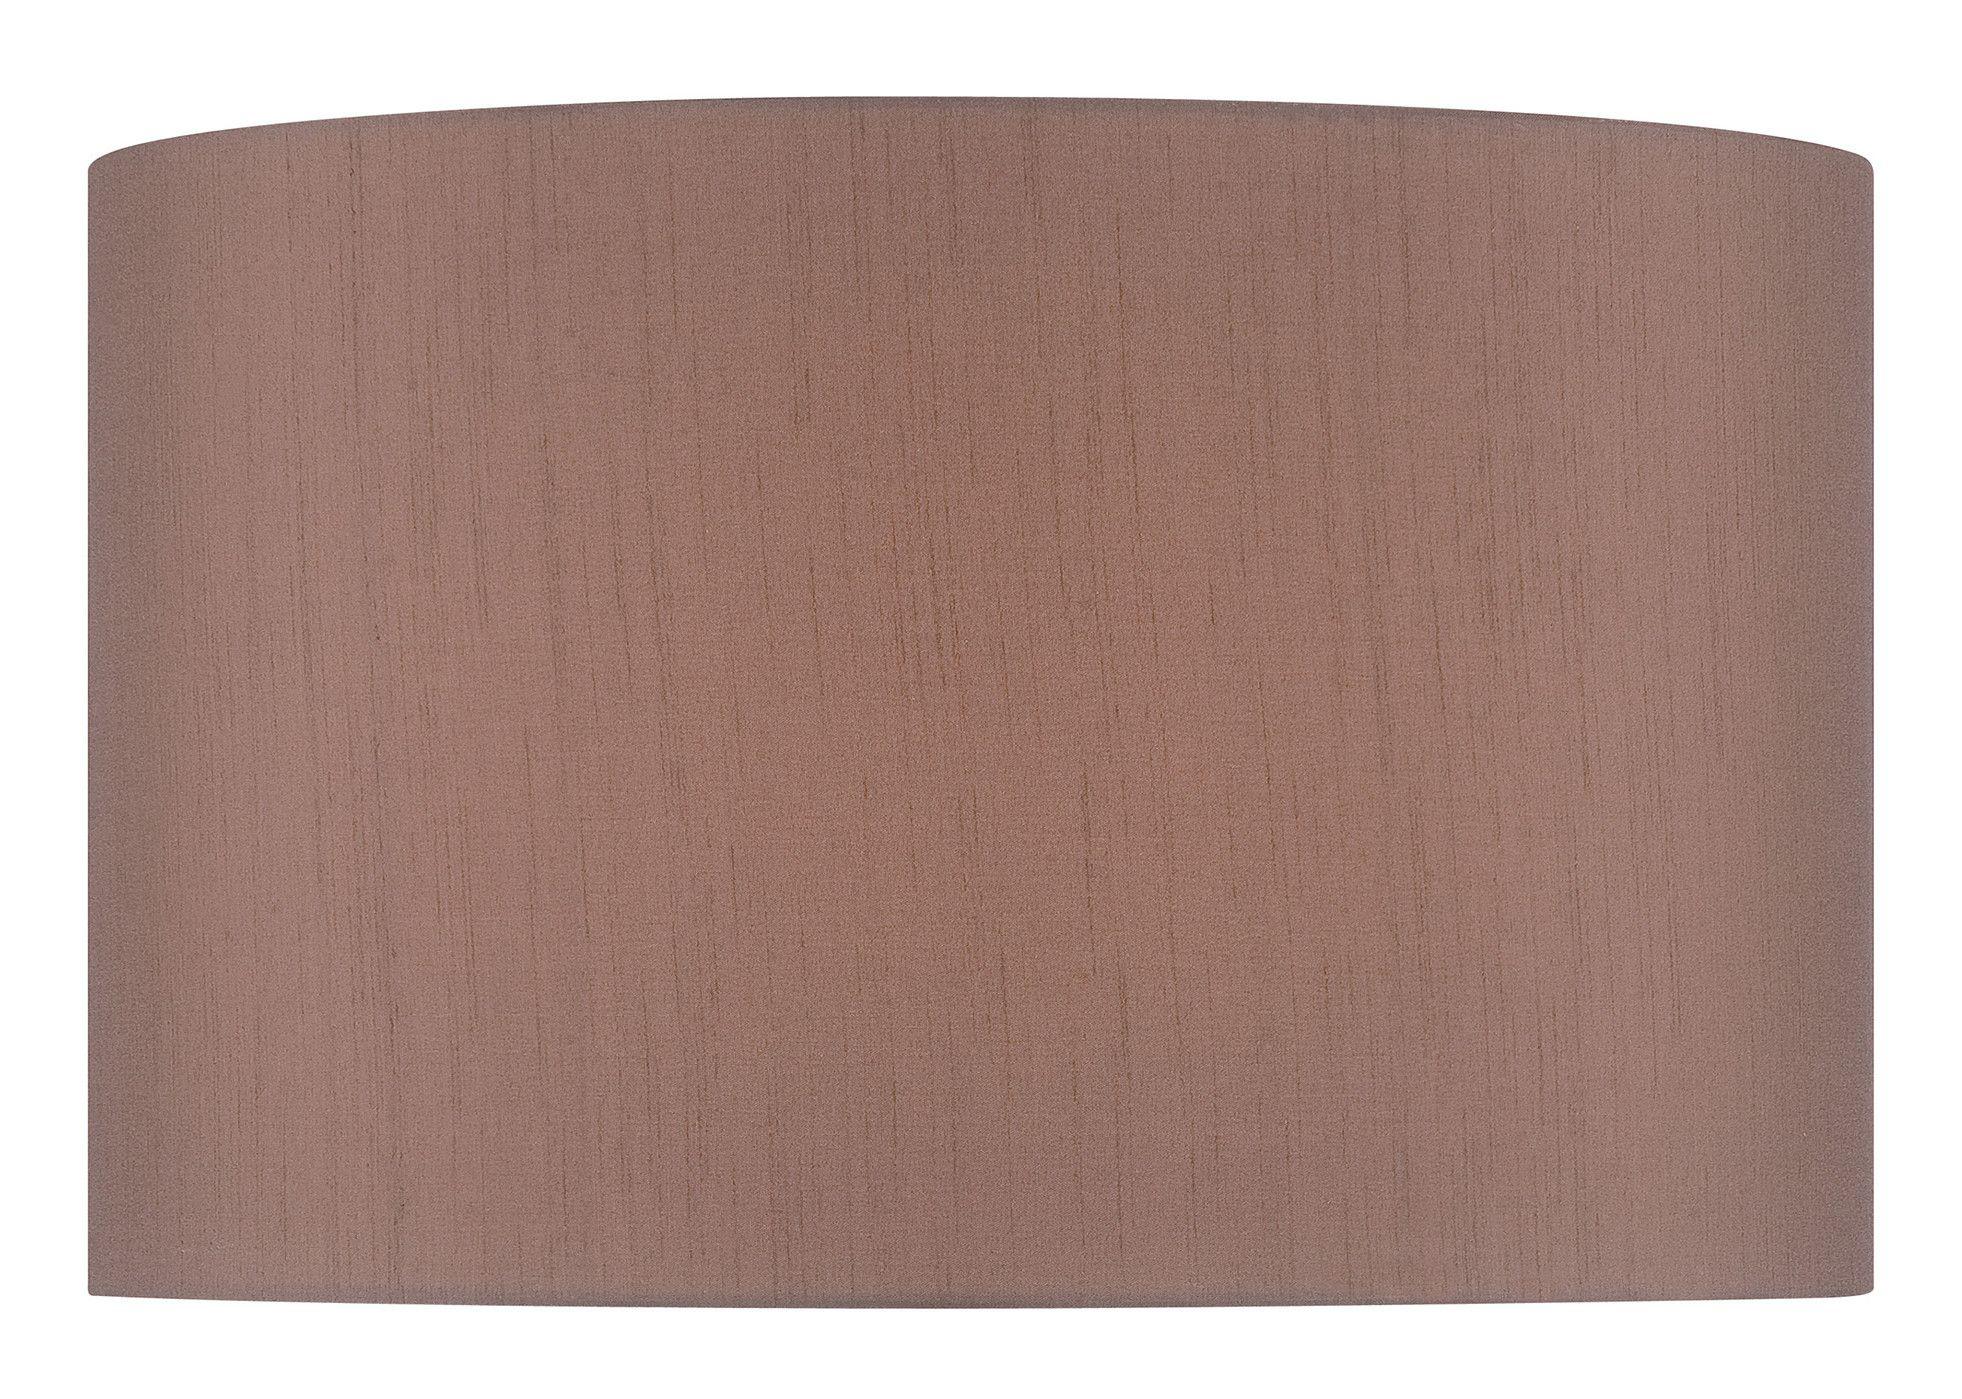 18 fabric drum lamp shade drum lamp shades drums and fabrics 18 fabric drum lamp shade aloadofball Gallery